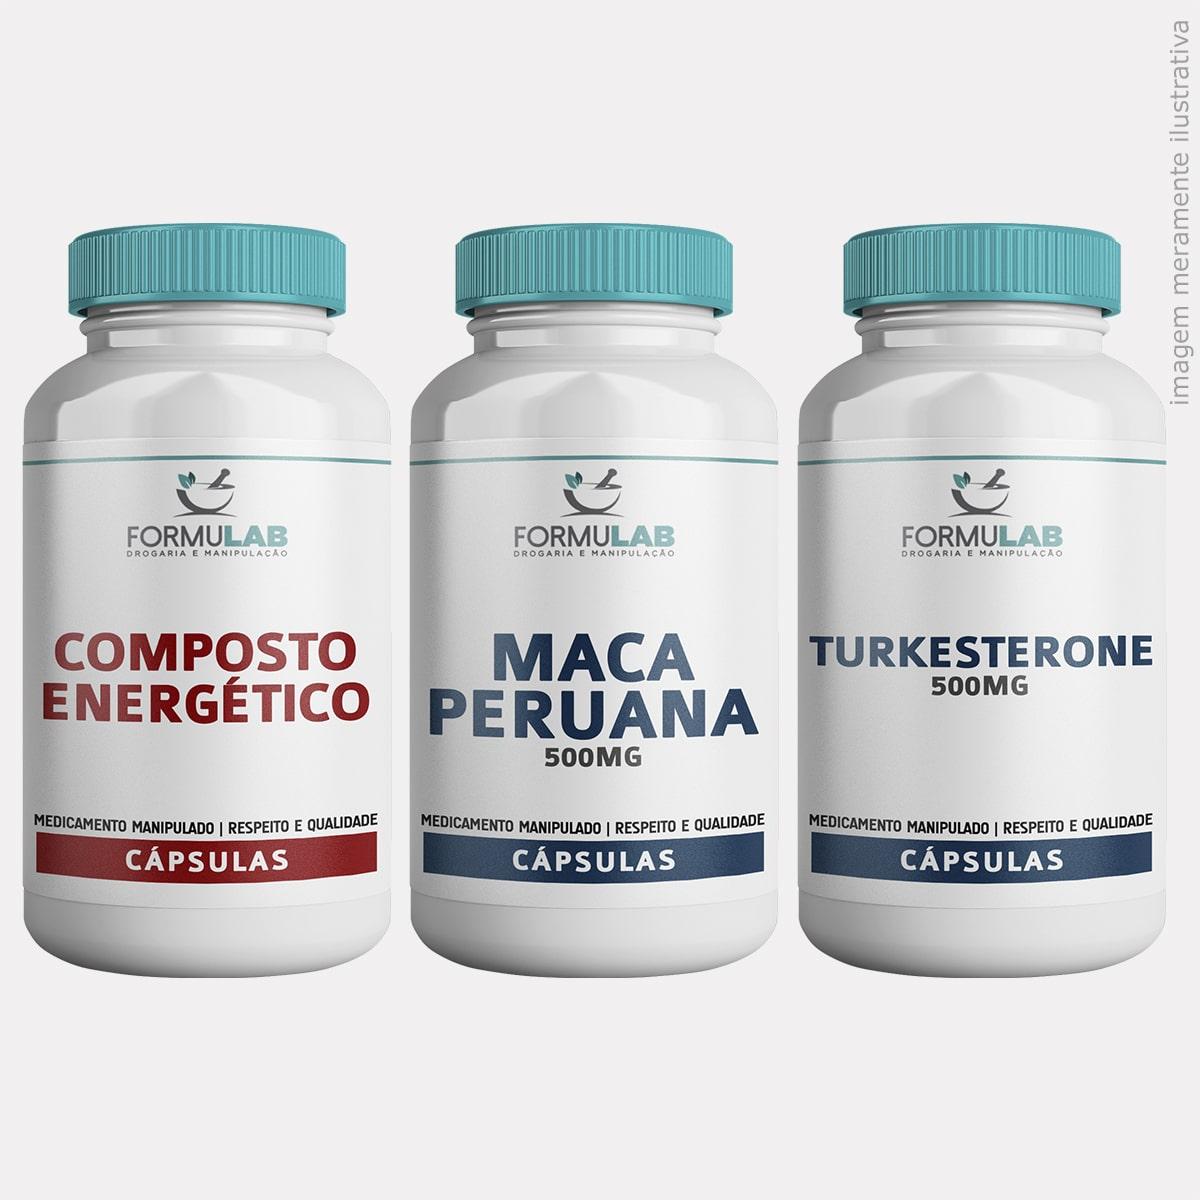 Kit DESEMPENHO FÍSICO - Composto Enérgico +  Maca Peruana 500mg + Turkesterone 500mg